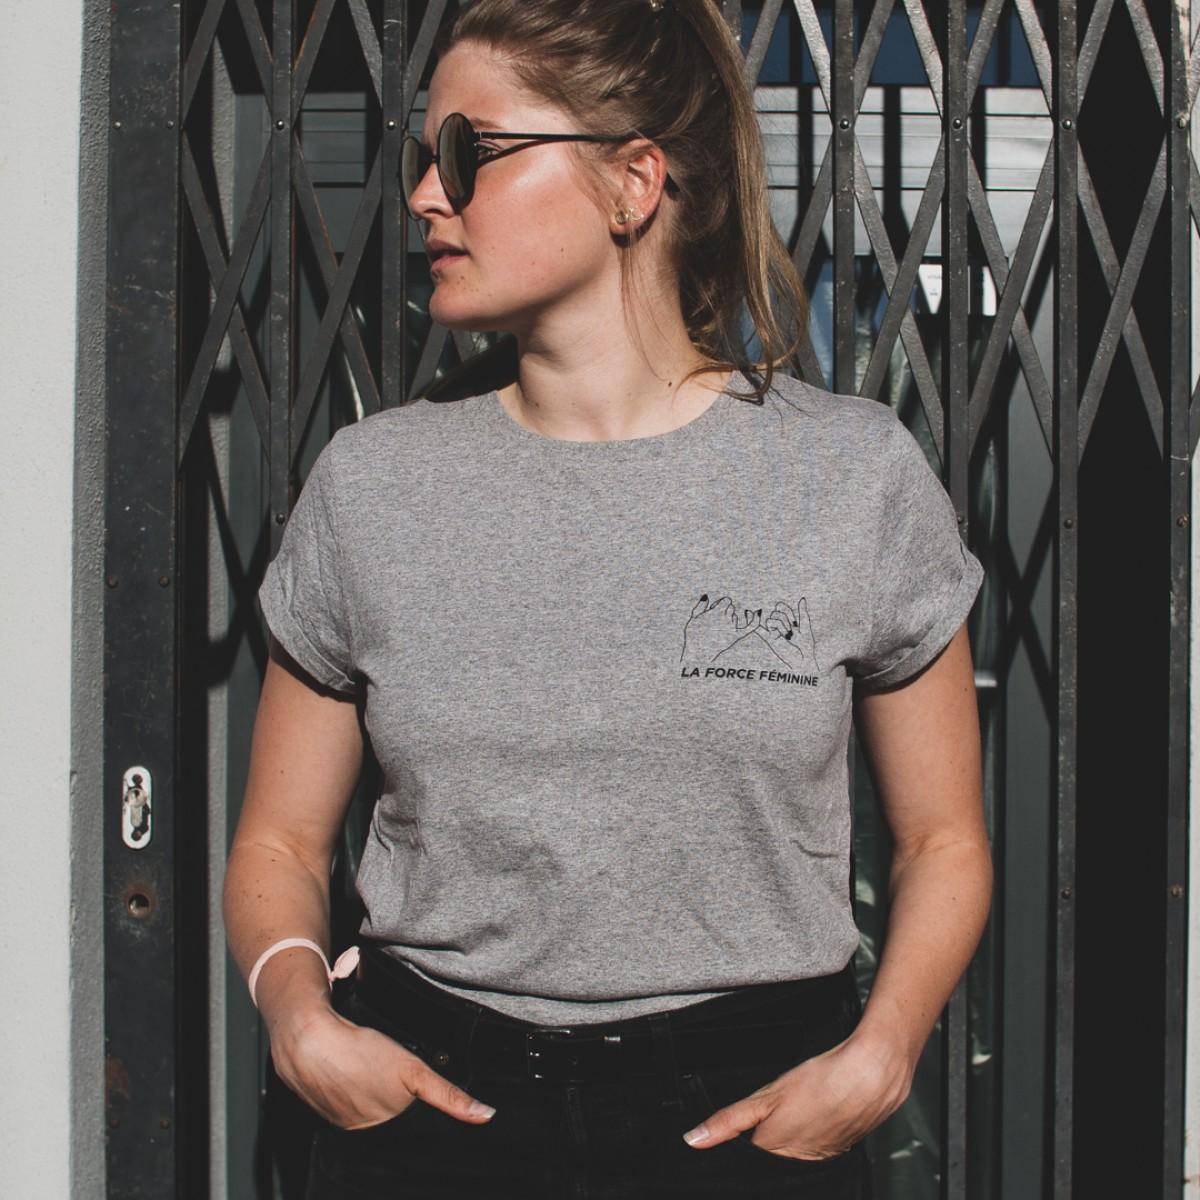 ÄSTHETIKA T-Shirt Roll Up - LA FORCE FÉMININE grey/black